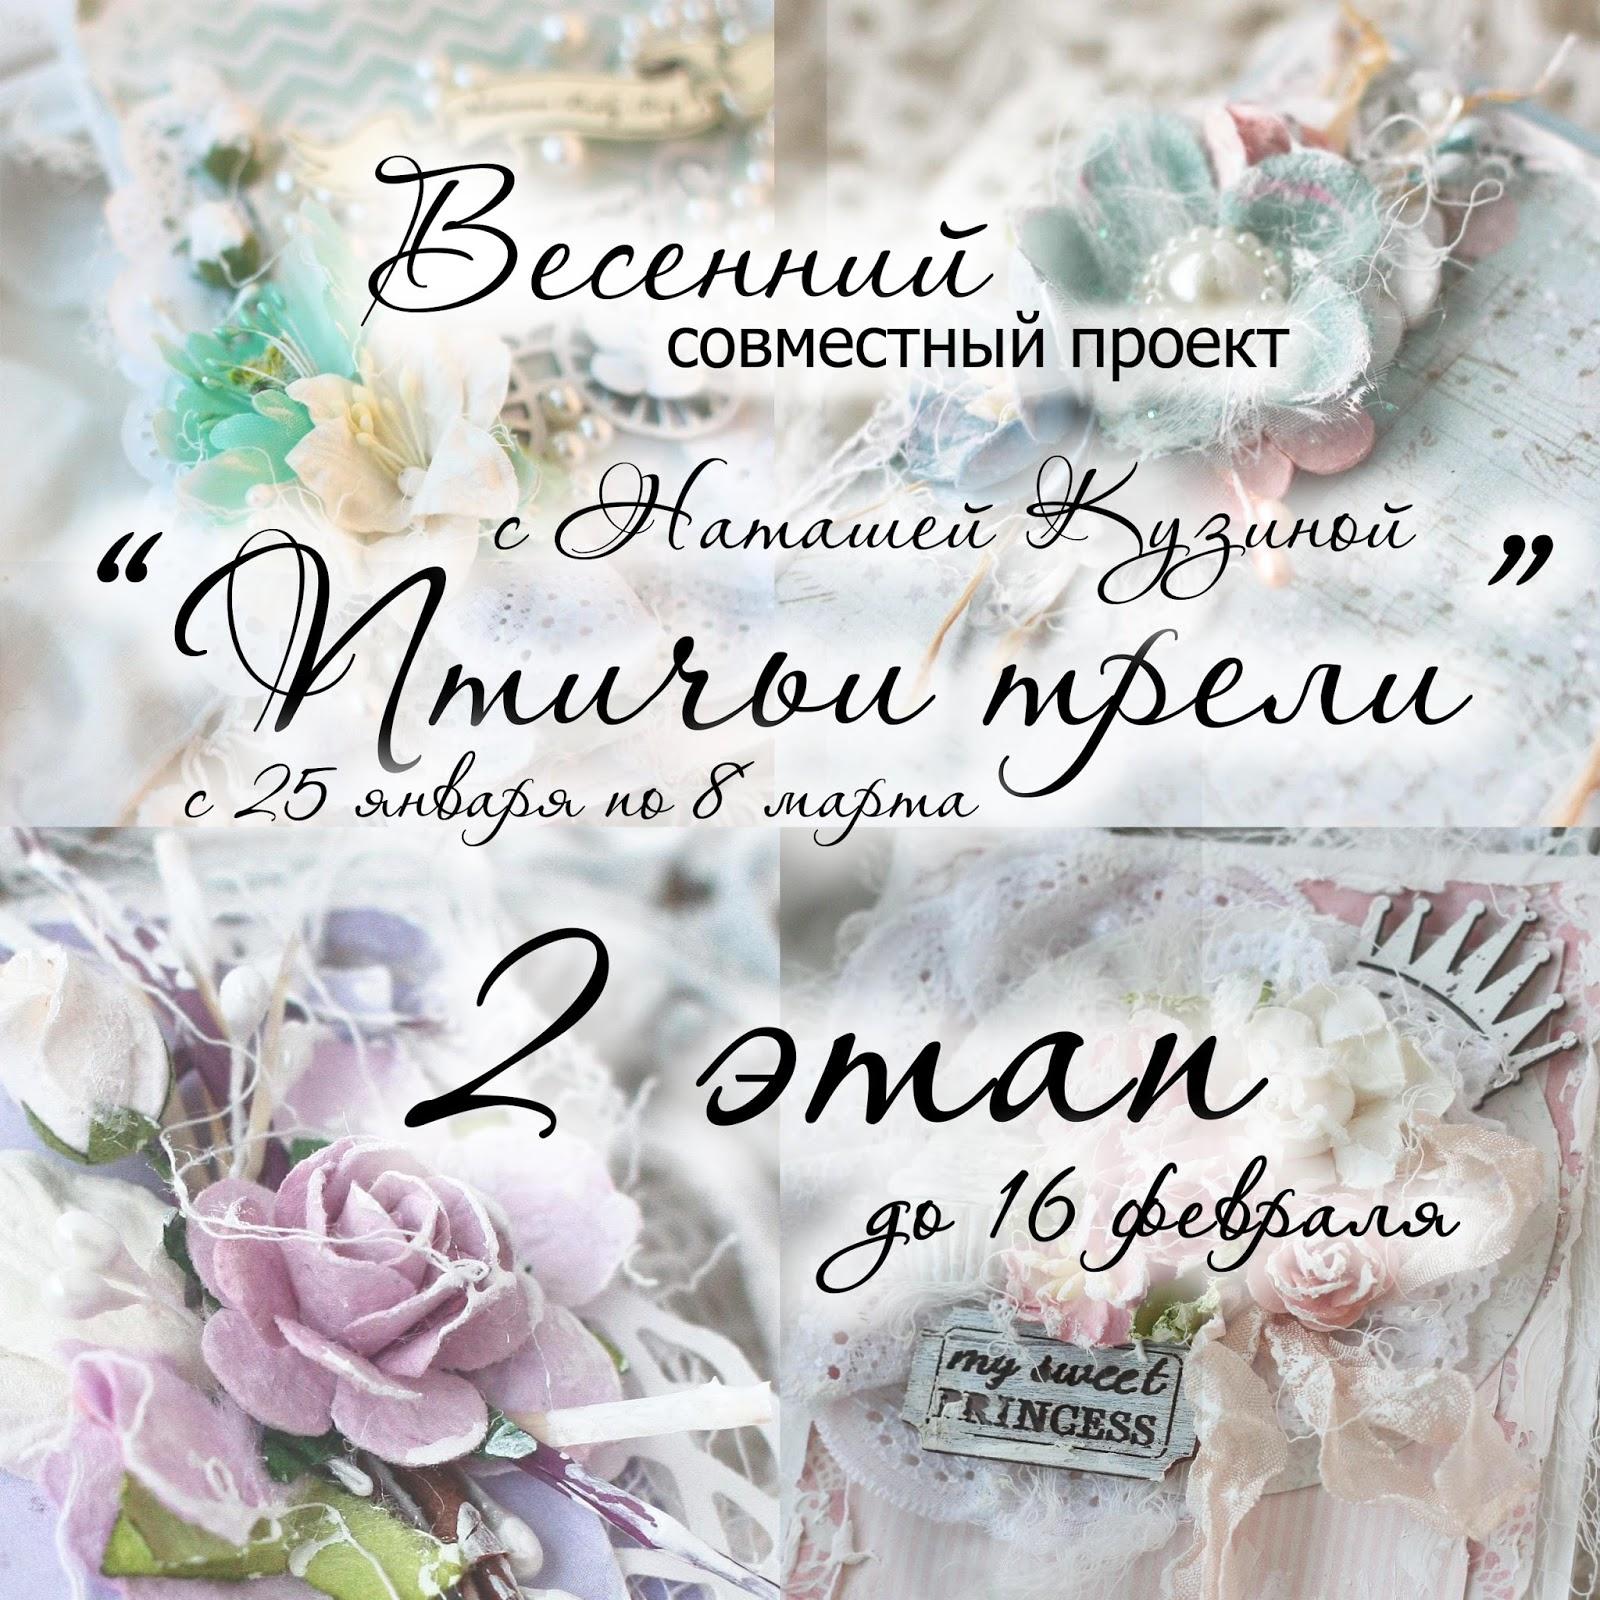 http://ruchnye-podarki.blogspot.ru/2015/02/2.html?showComment=1422883327531#c454941348538985060